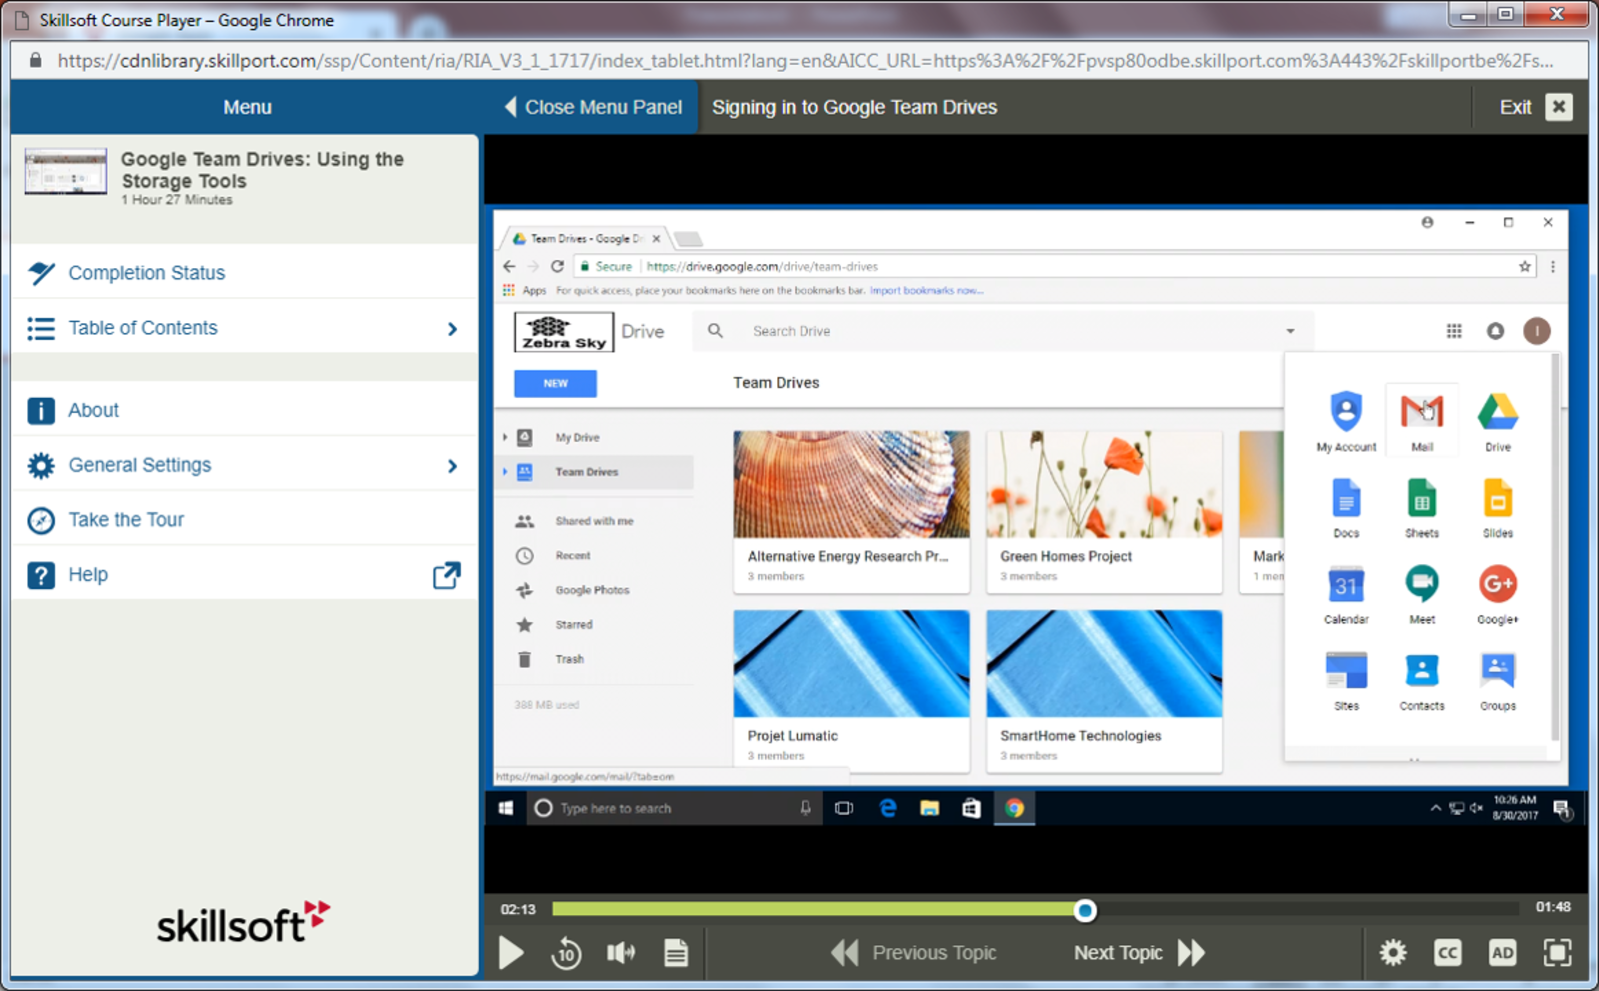 Google Google Team Drives E-Learning Kurs